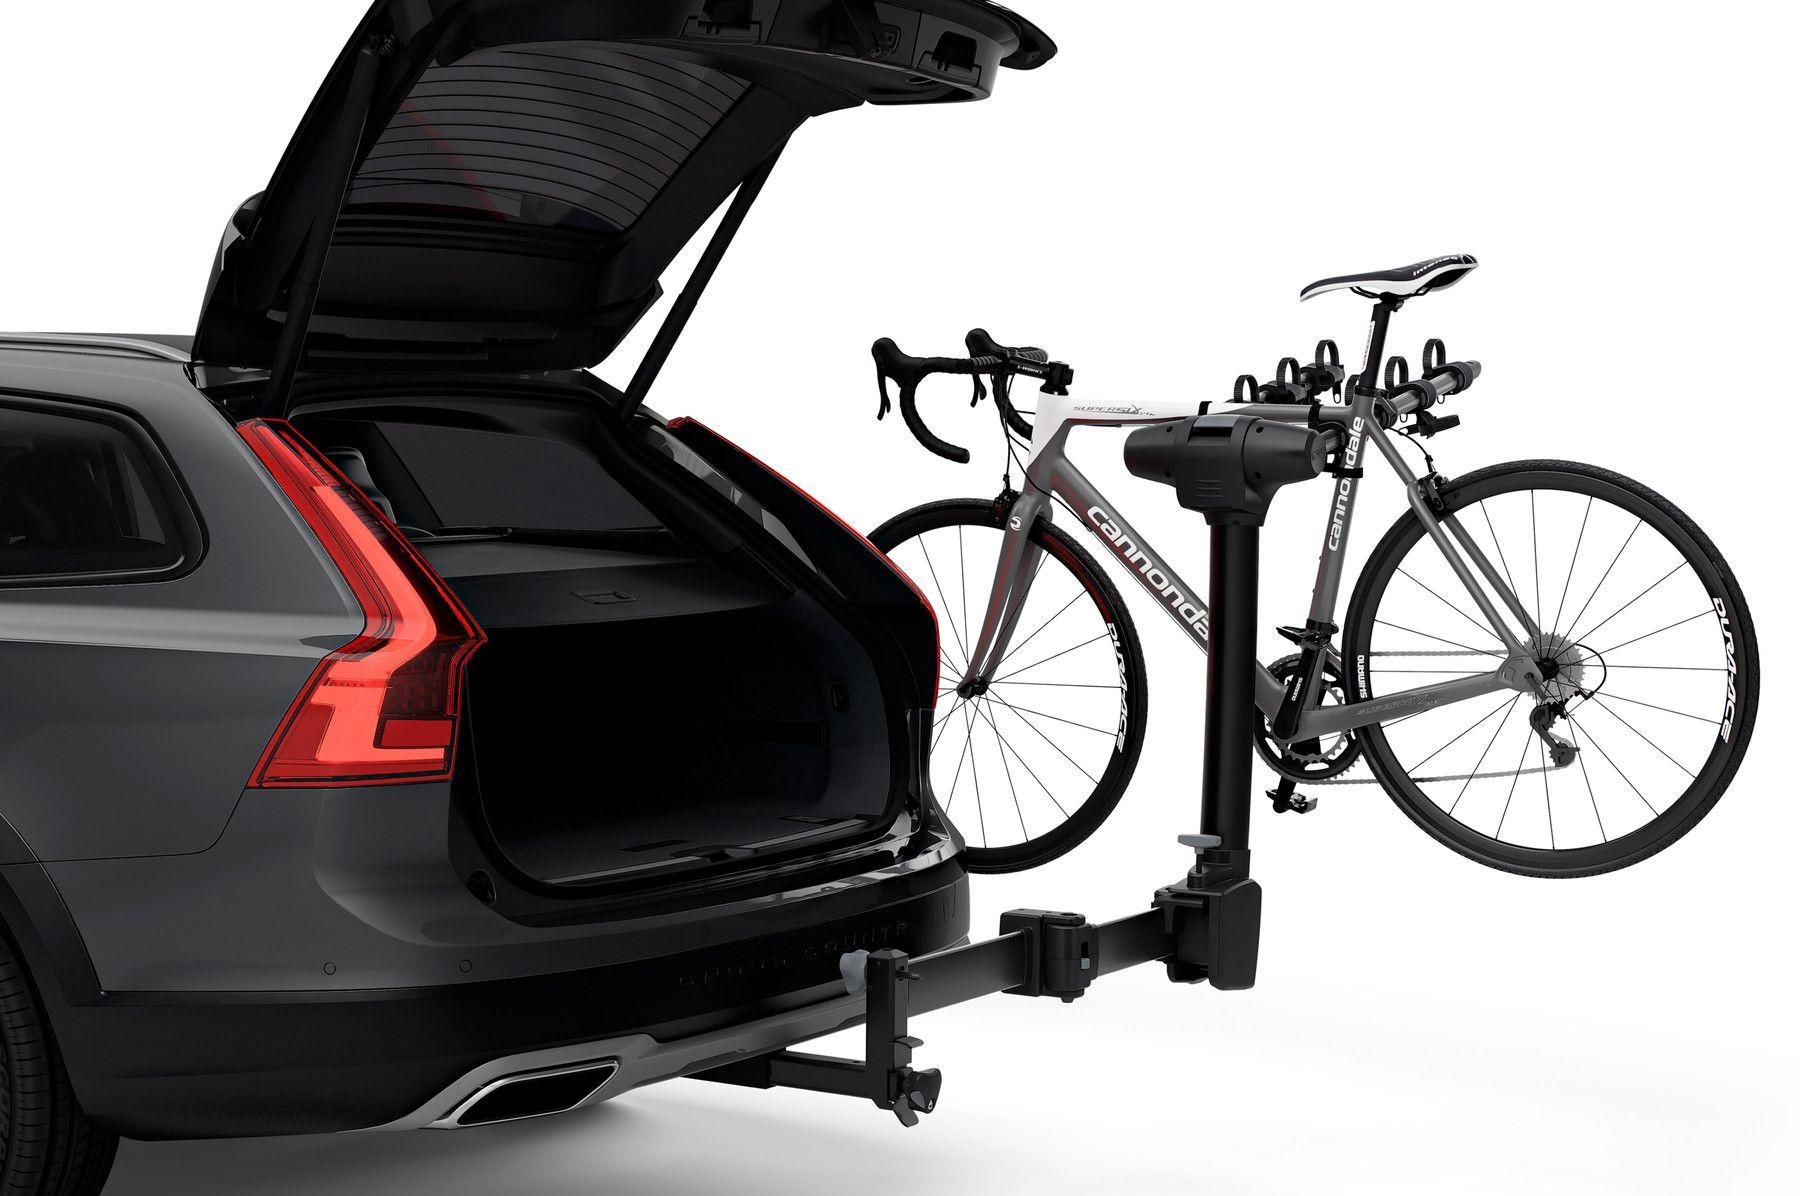 Thule Apex Xt Swing 4 In 2020 Hitch Bike Rack Bike Rack Summer